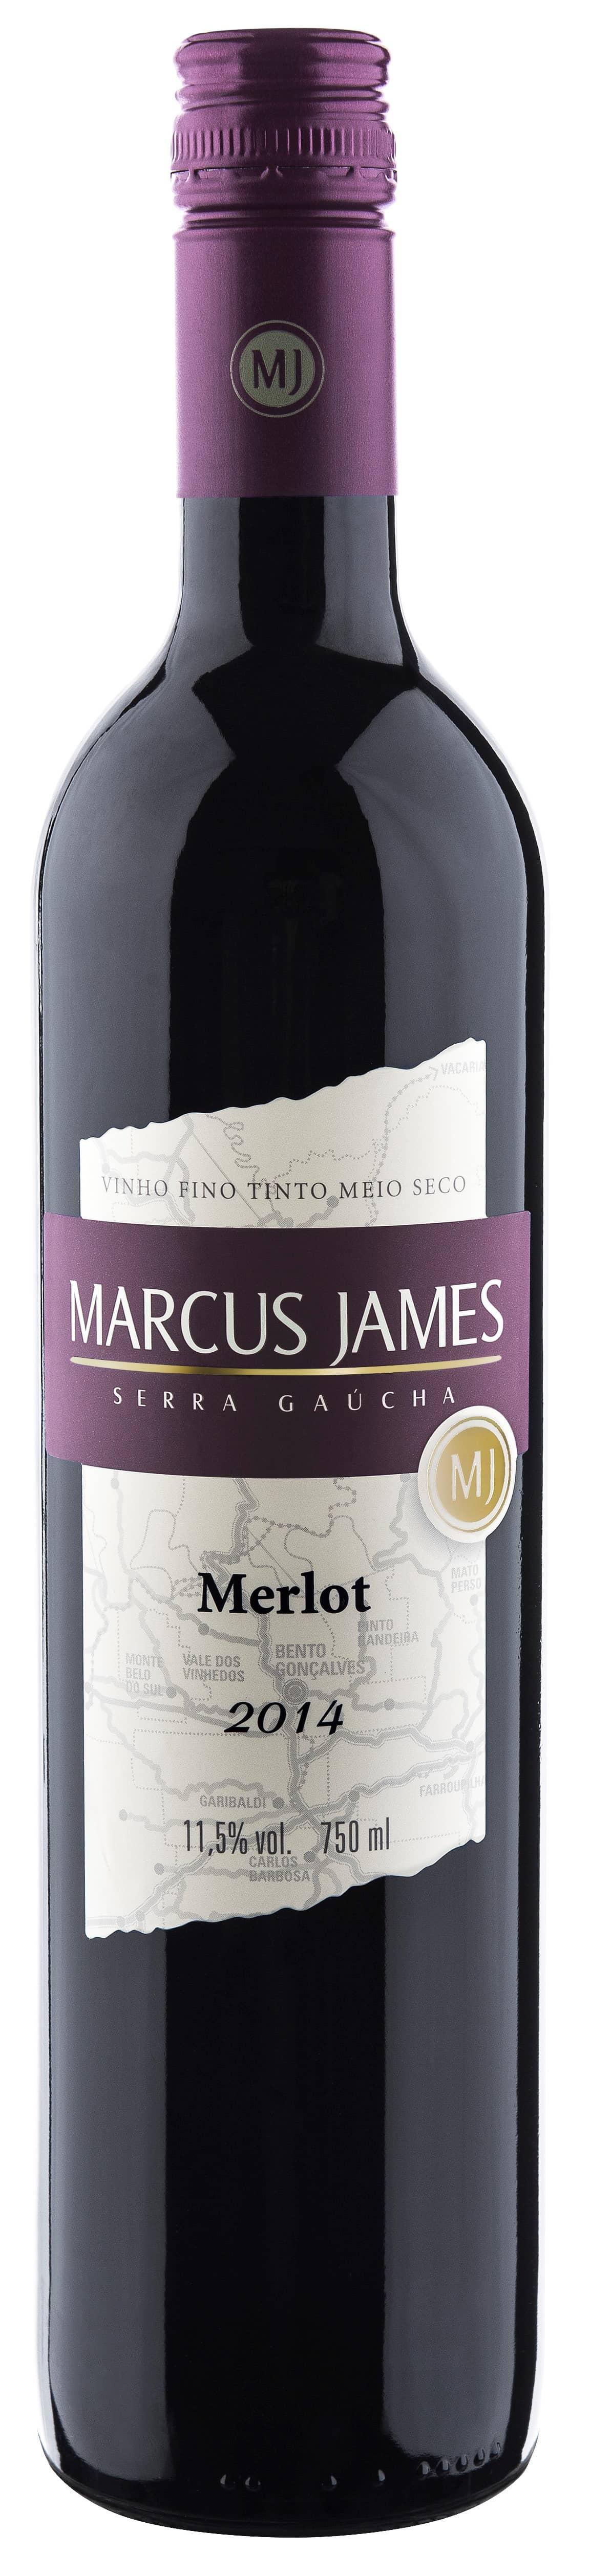 Marcus-James-Merlot